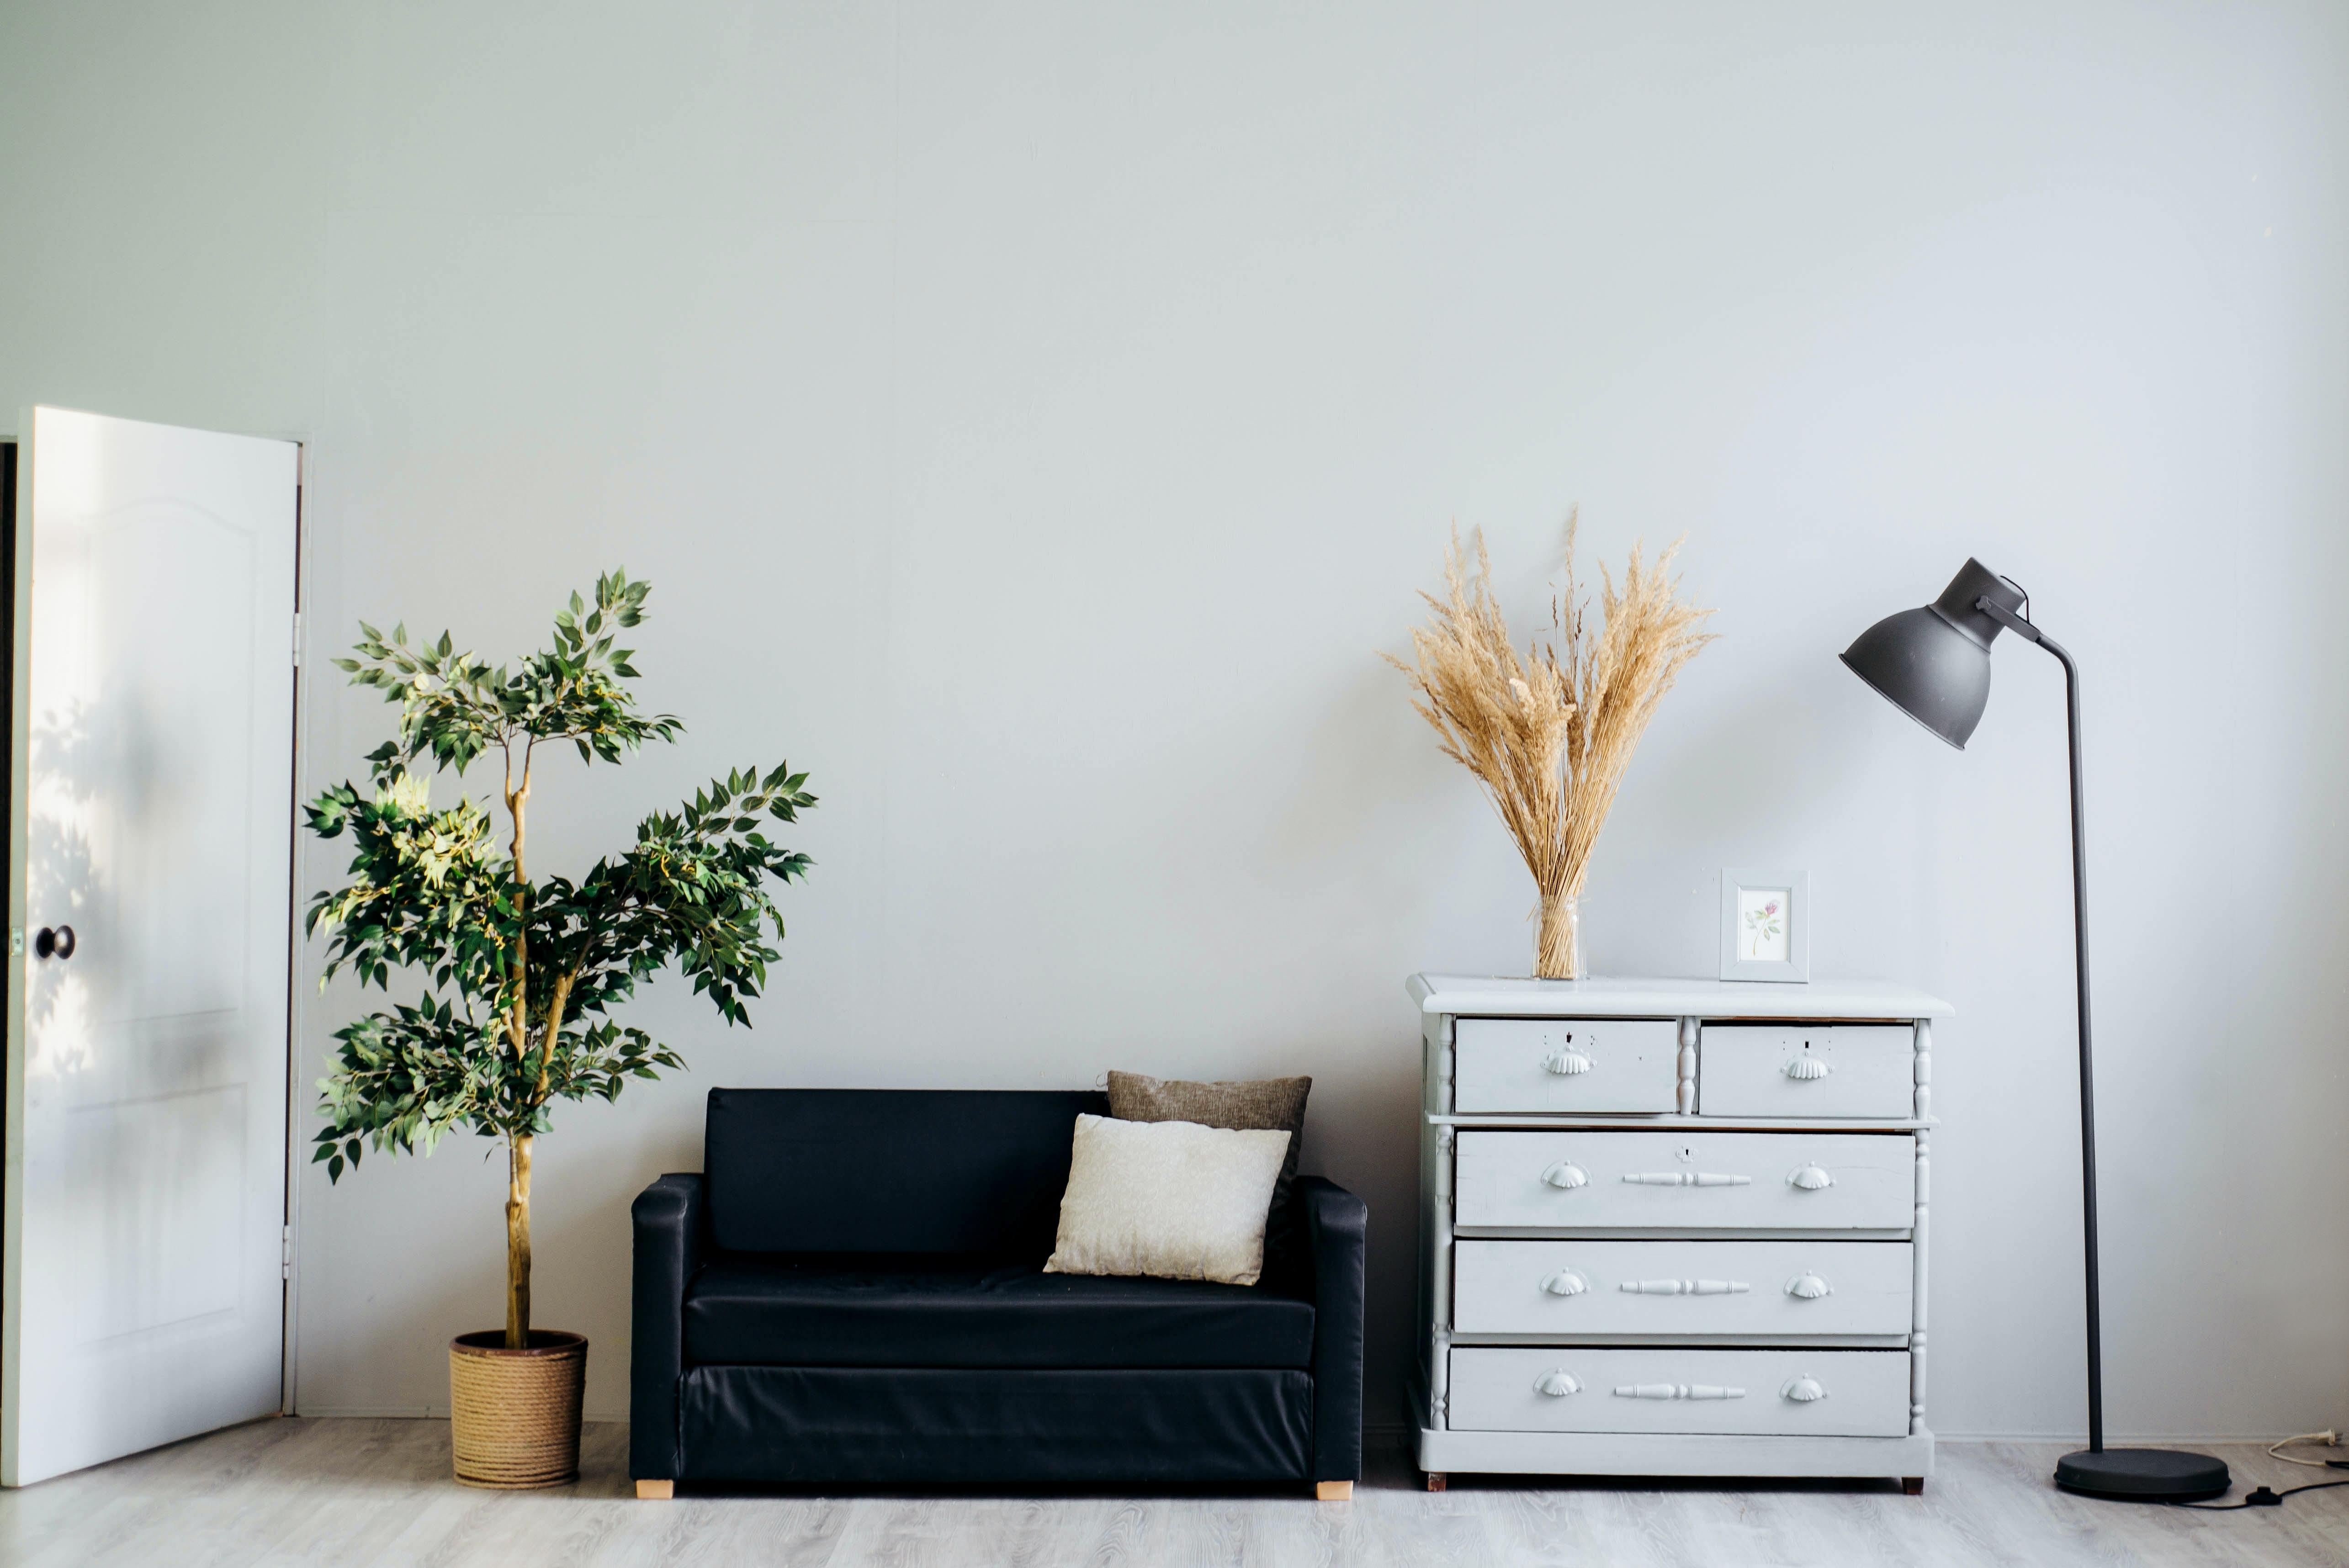 20+ Best Free Interior Pictures On Unsplash